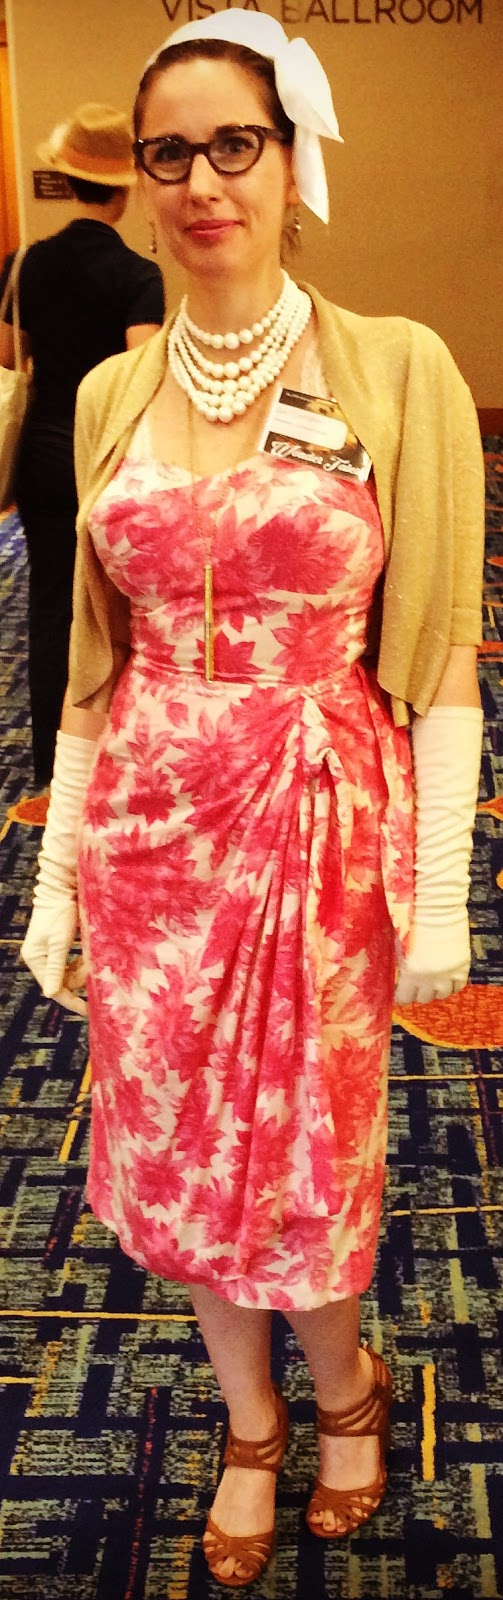 Retro Rack Gail Carriger In Vintage 1950s Pink Flowered